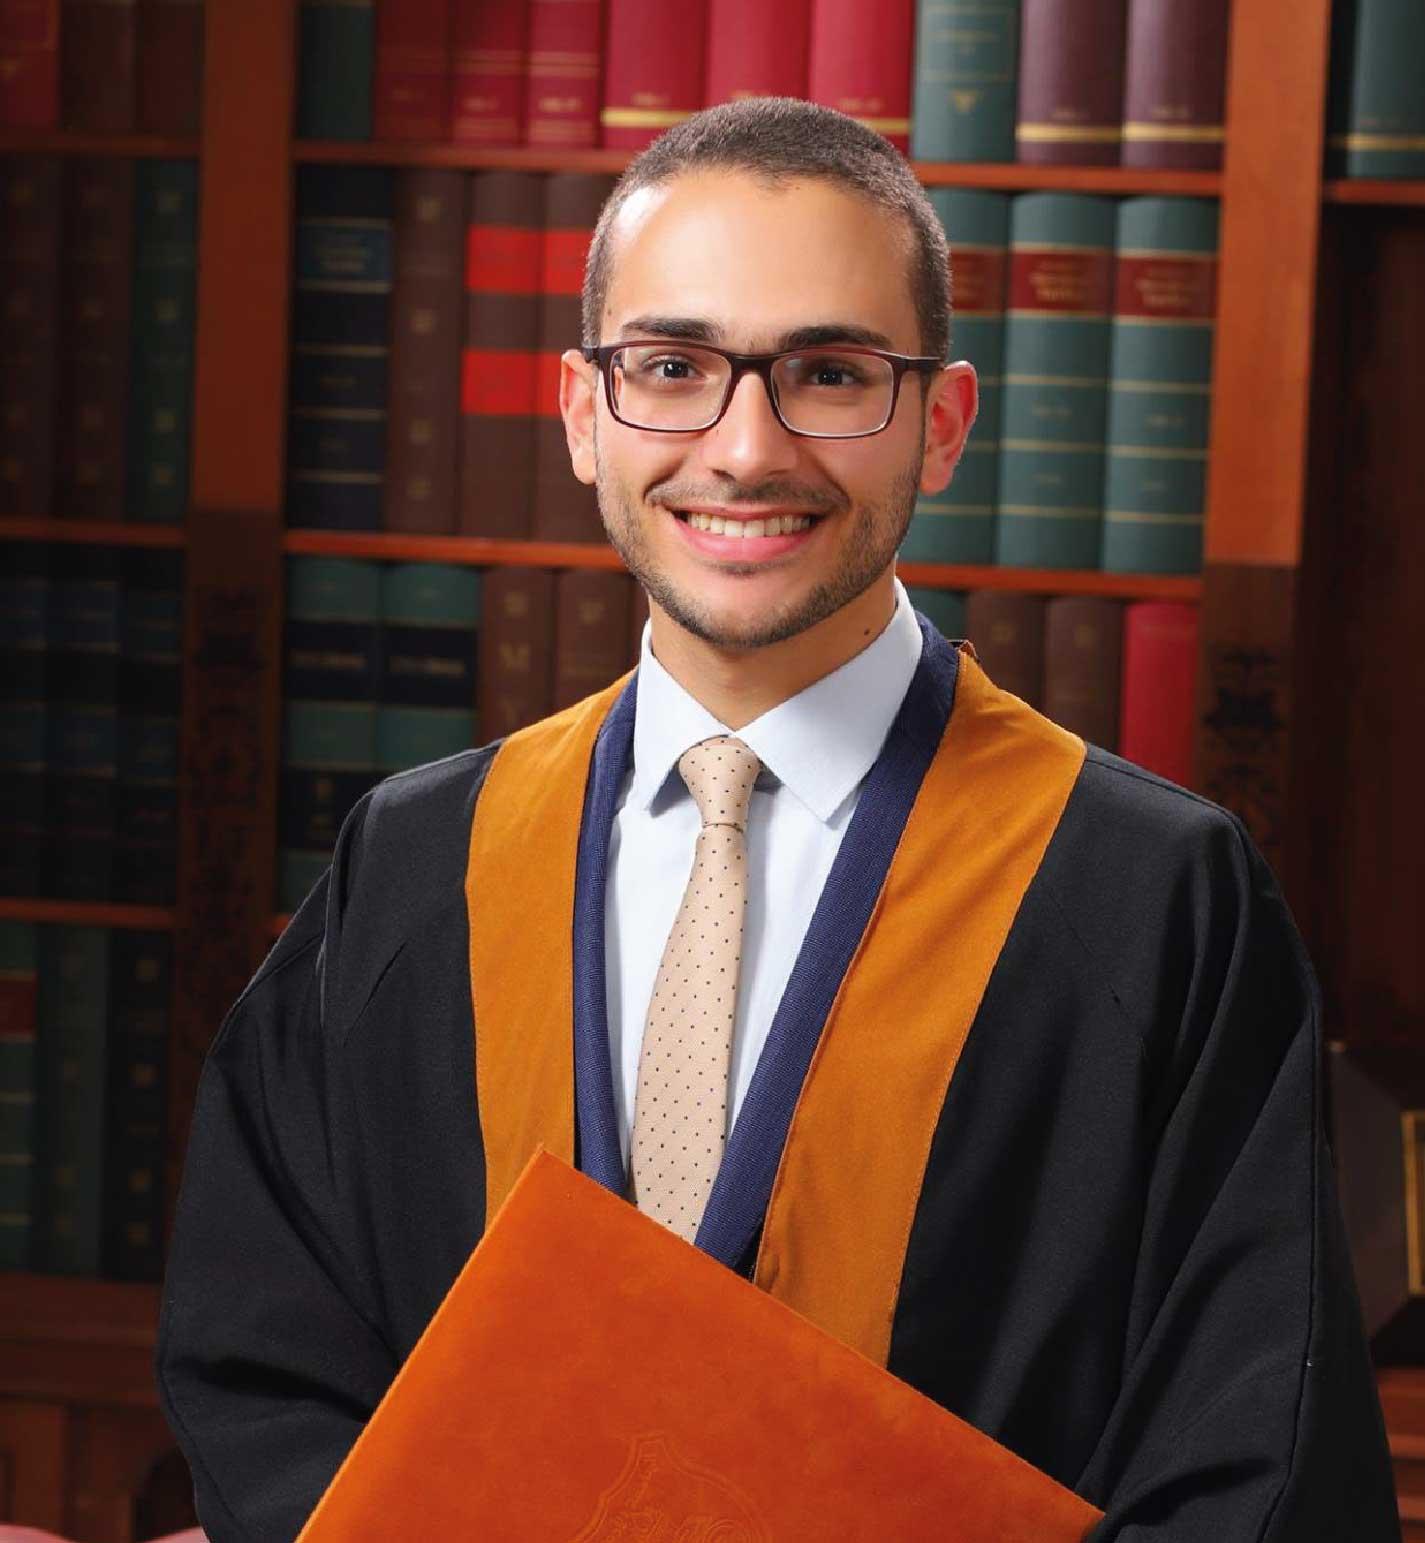 Eng. Mohammad Zamil